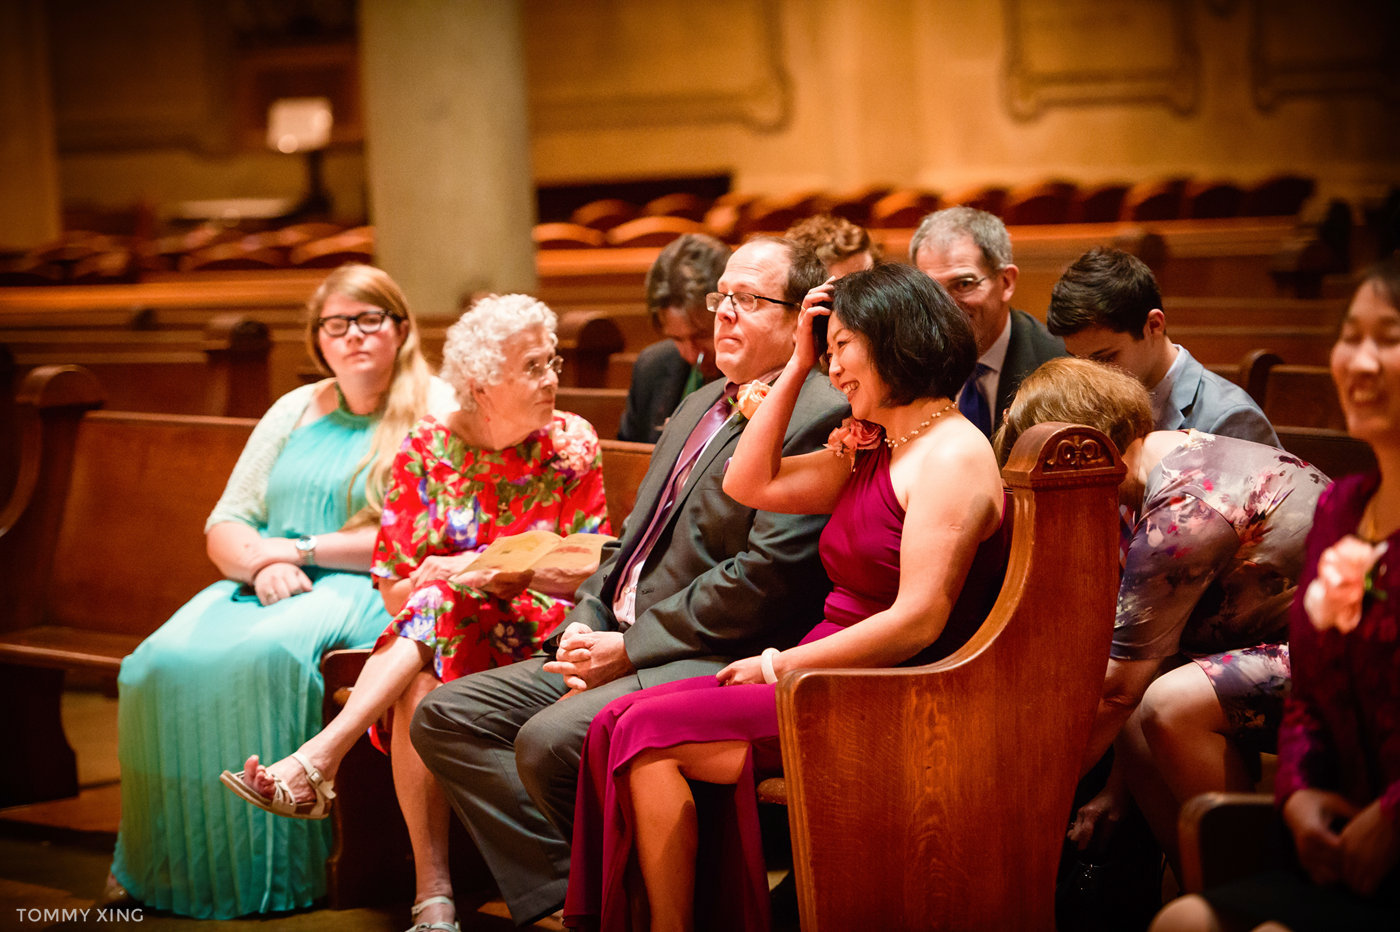 STANFORD MEMORIAL CHURCH WEDDING - Wenjie & Chengcheng - SAN FRANCISCO BAY AREA 斯坦福教堂婚礼跟拍 - 洛杉矶婚礼婚纱照摄影师 Tommy Xing Photography060.jpg